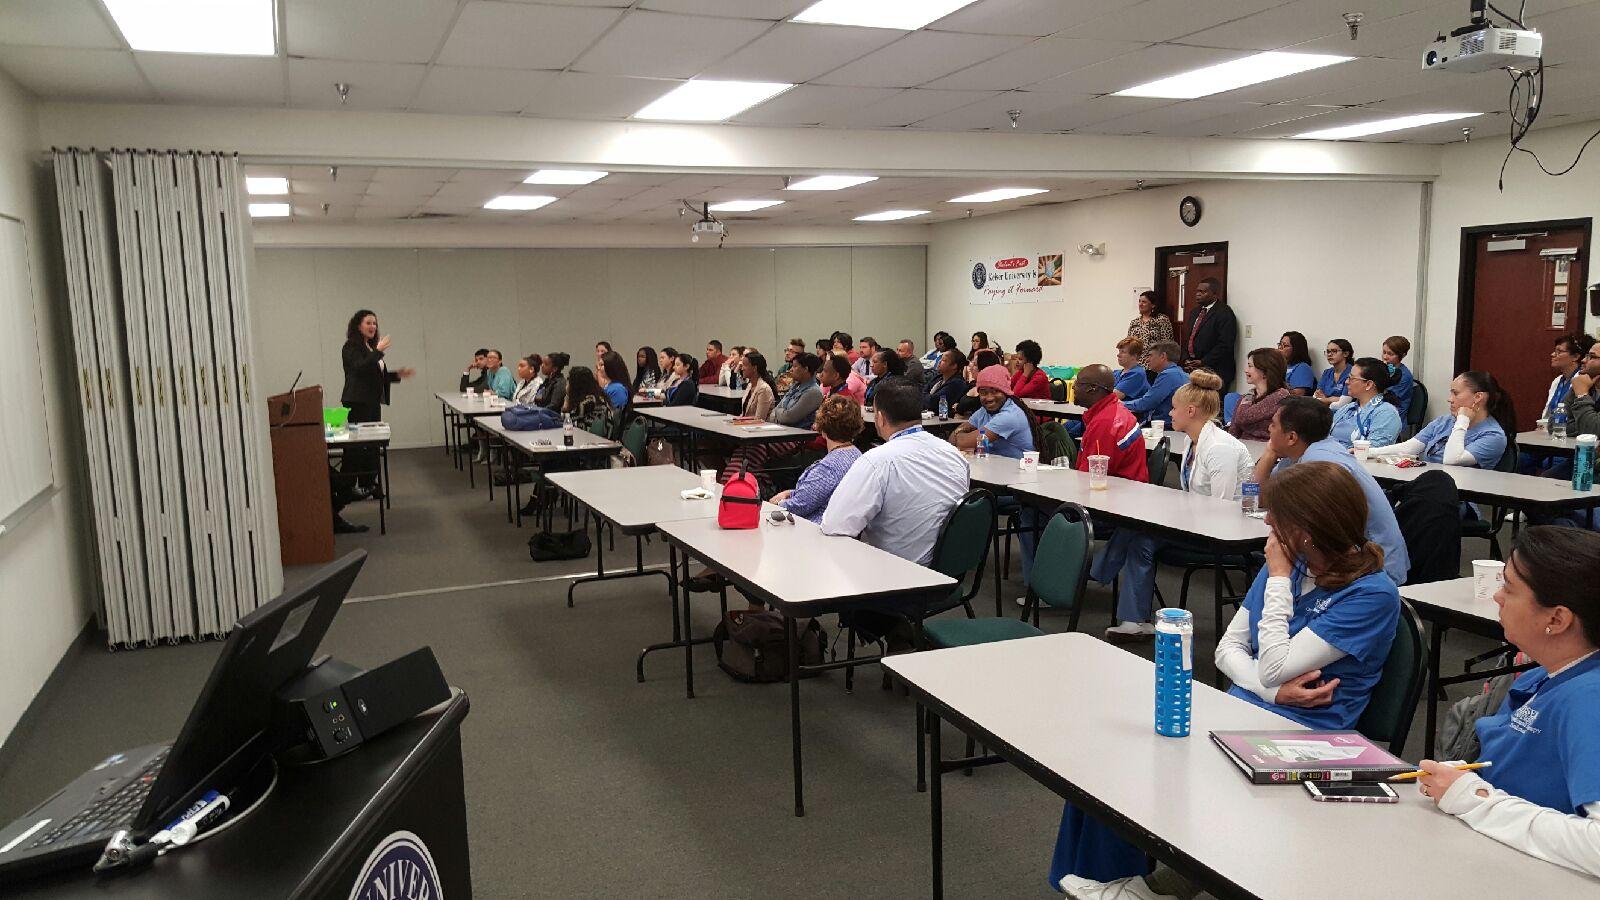 Orlando Welcomes Speakers from NABA, Toastmasters, & Robert Half